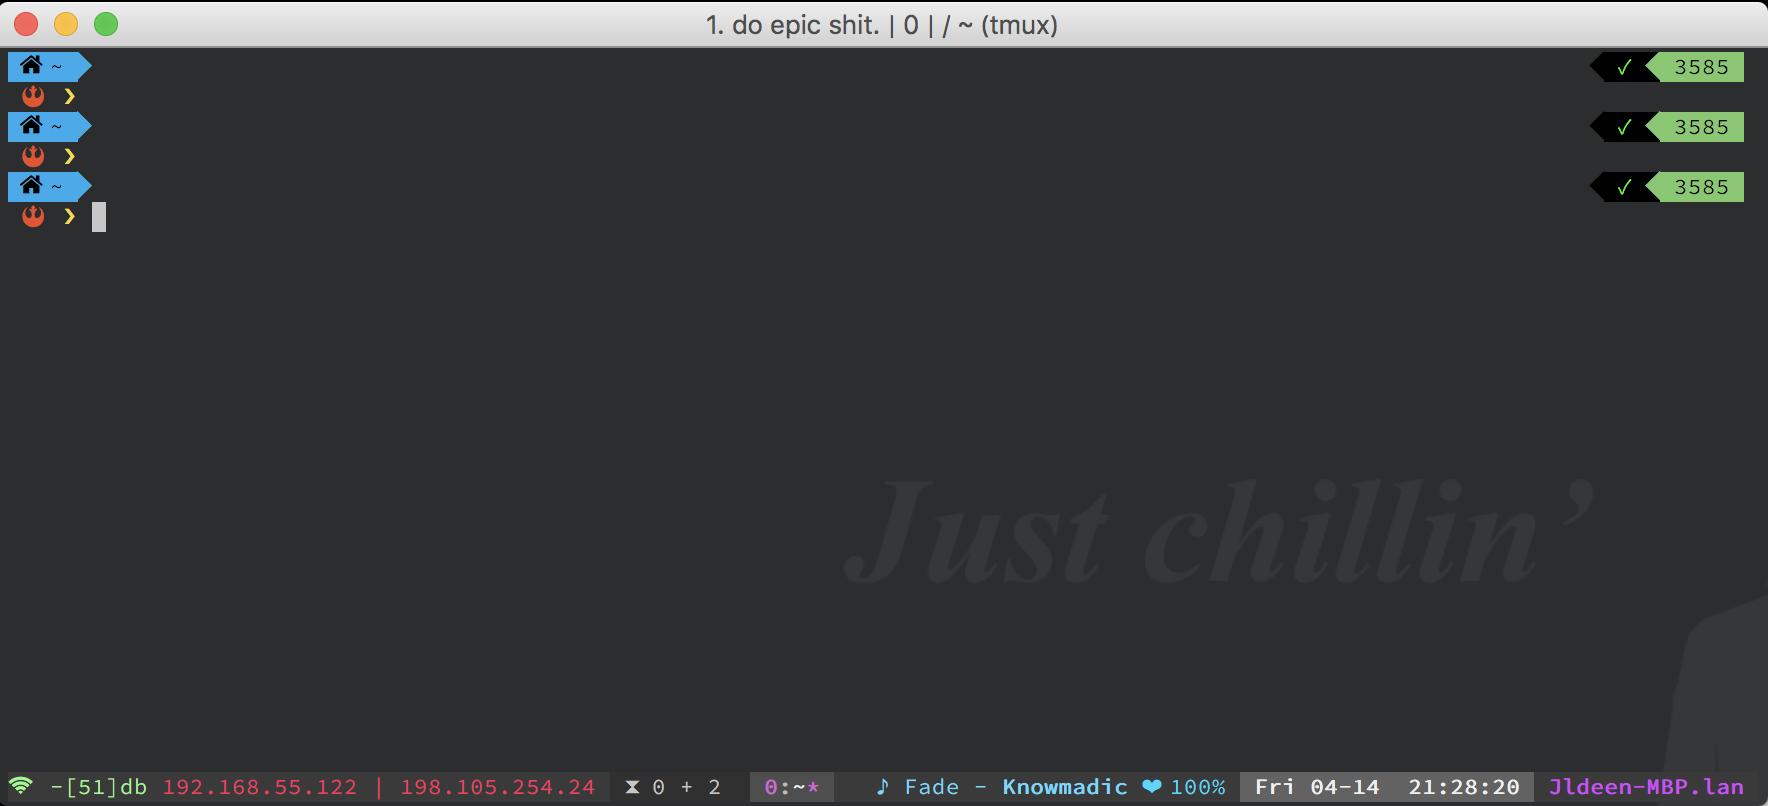 macOS ohmyzsh + tmux + vim + iTerm2 + Powerlevel9k = Badass terminal